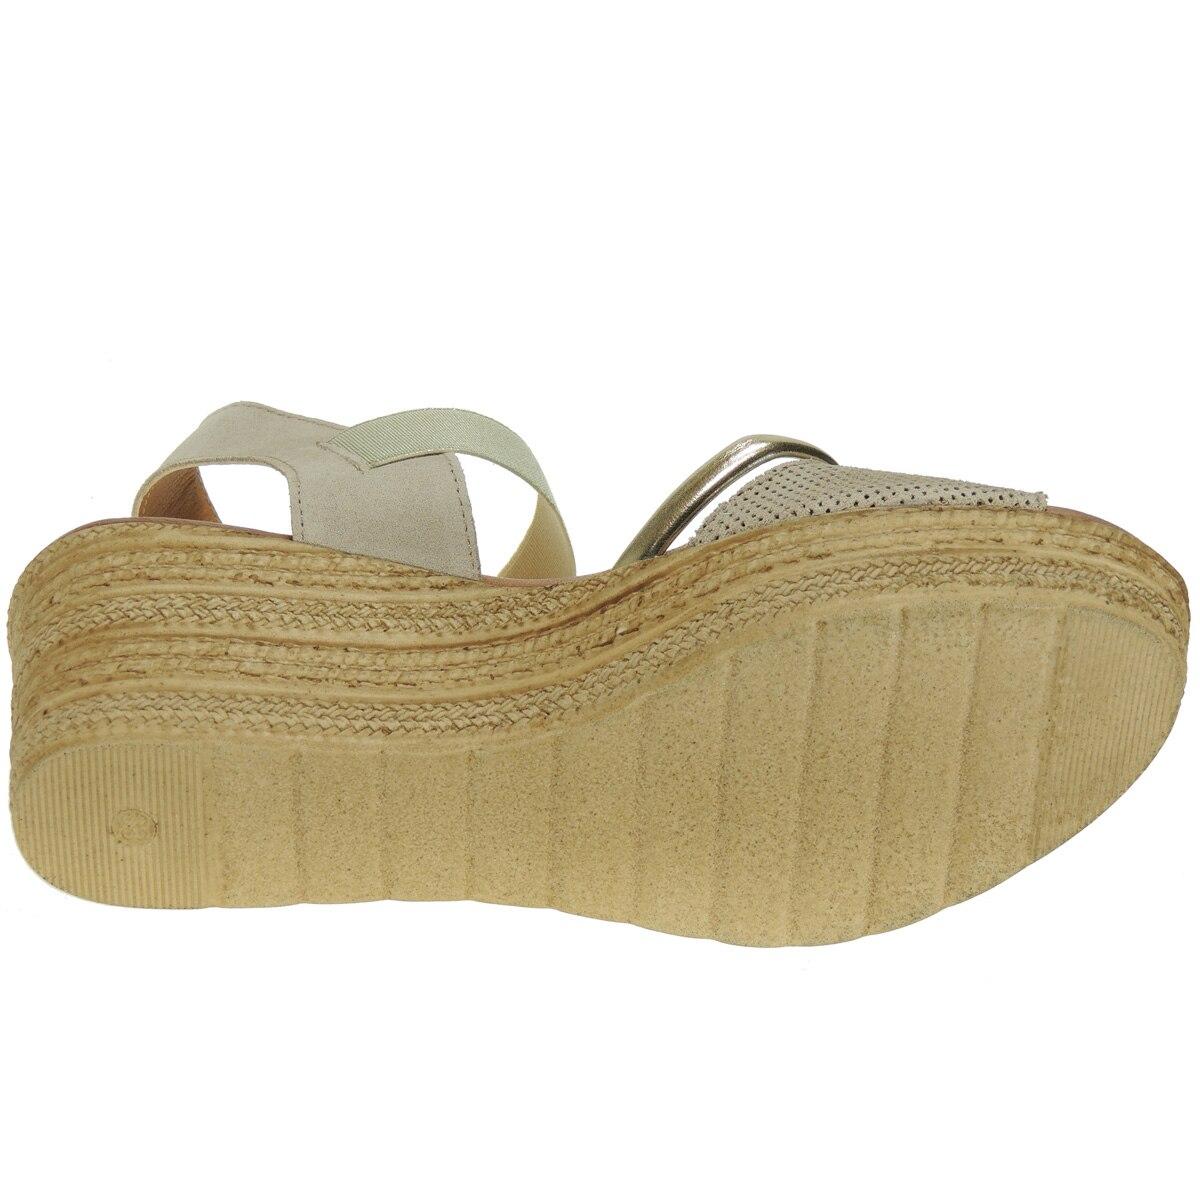 Chemisier 131 cuir sandale robe plante Gel plateforme 3Cm cale 7Cm elastique femme - 5